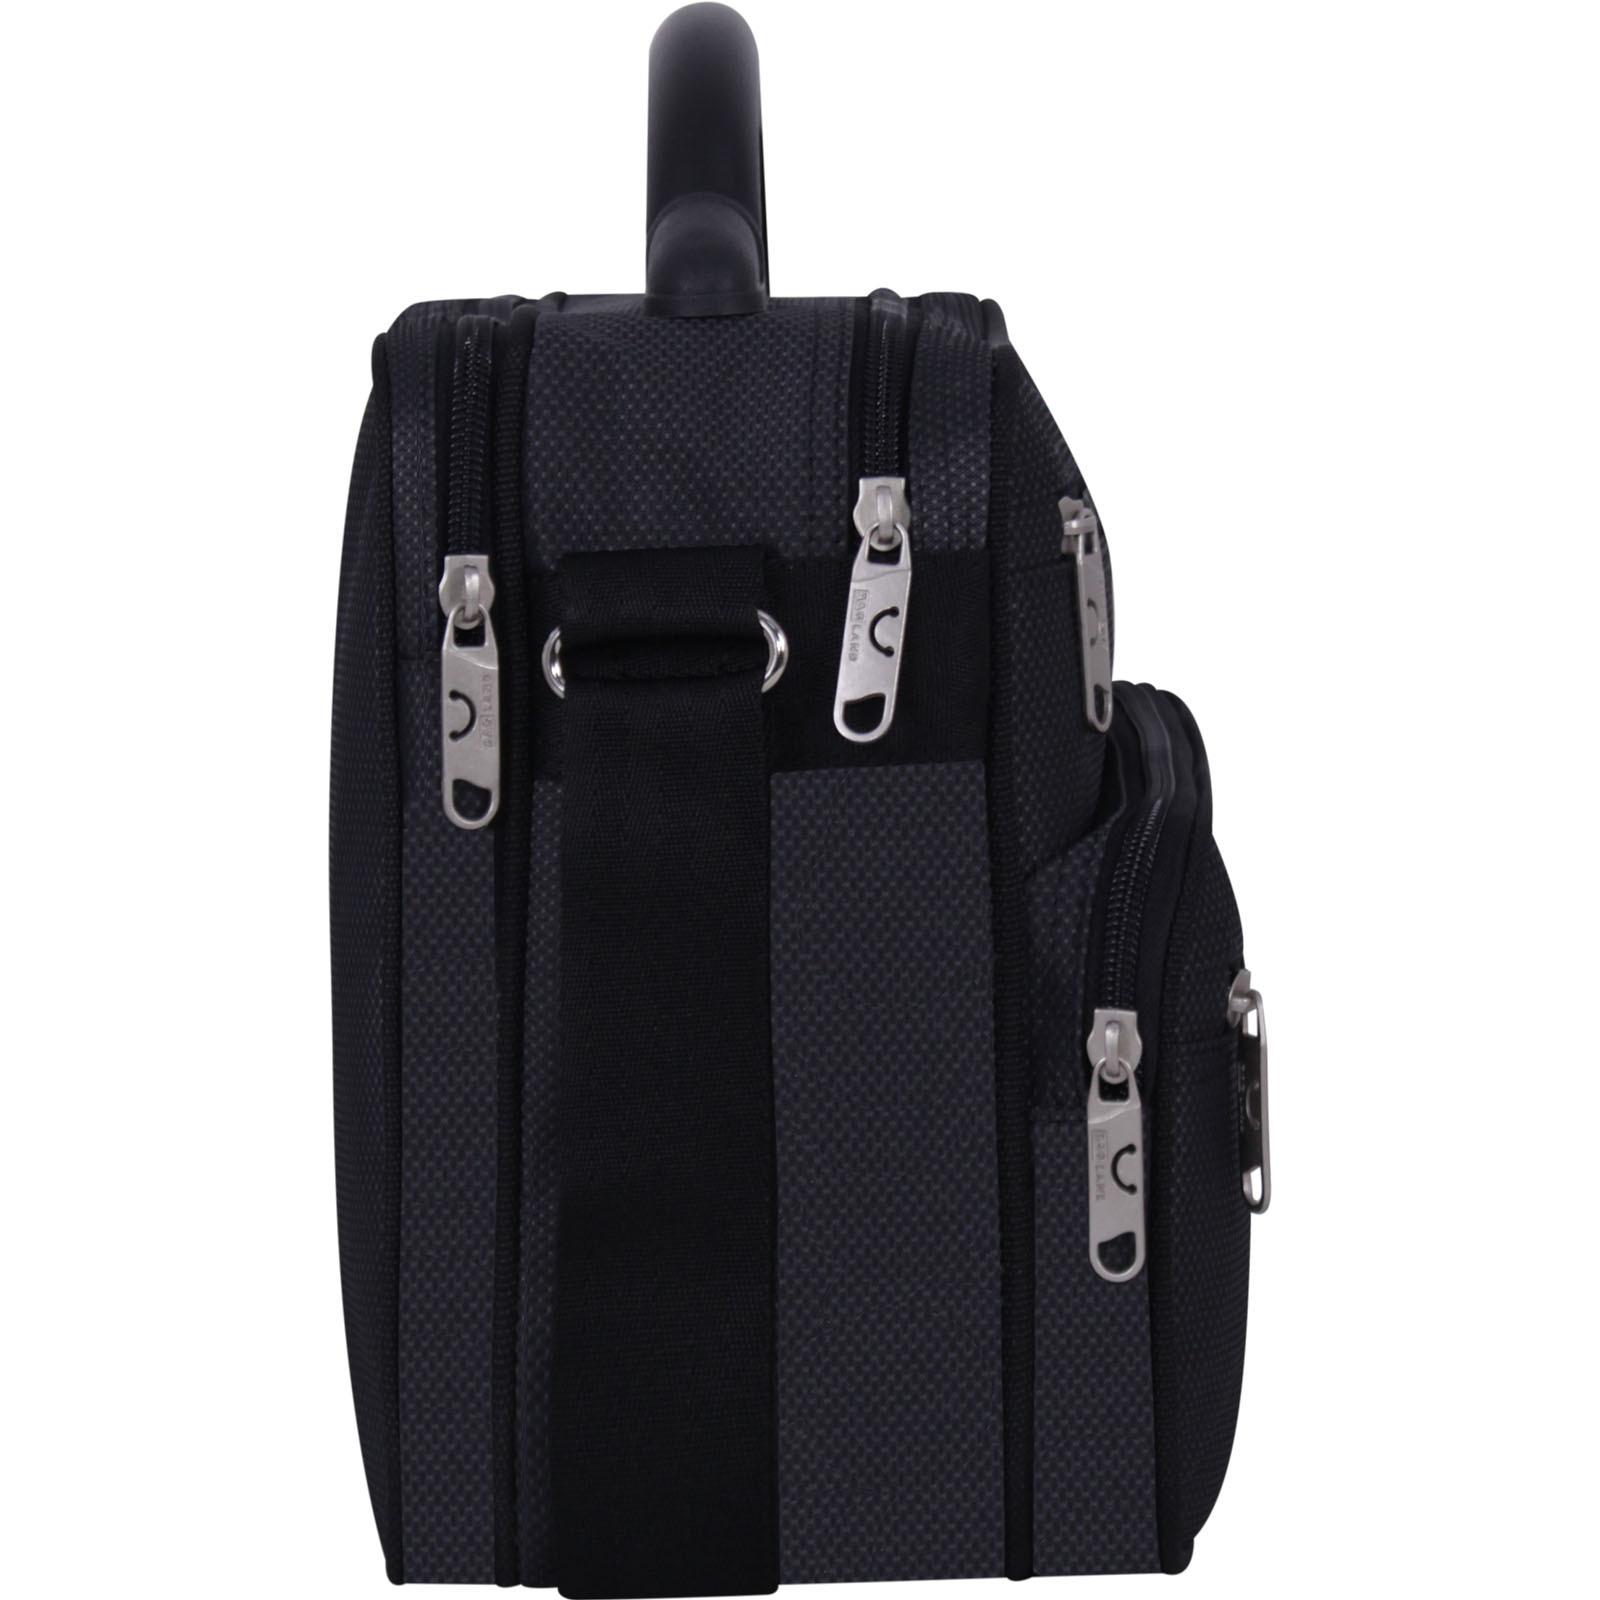 Мужская сумка Bagland Mr.Braun 8 л. Чёрный (00240169) фото 2